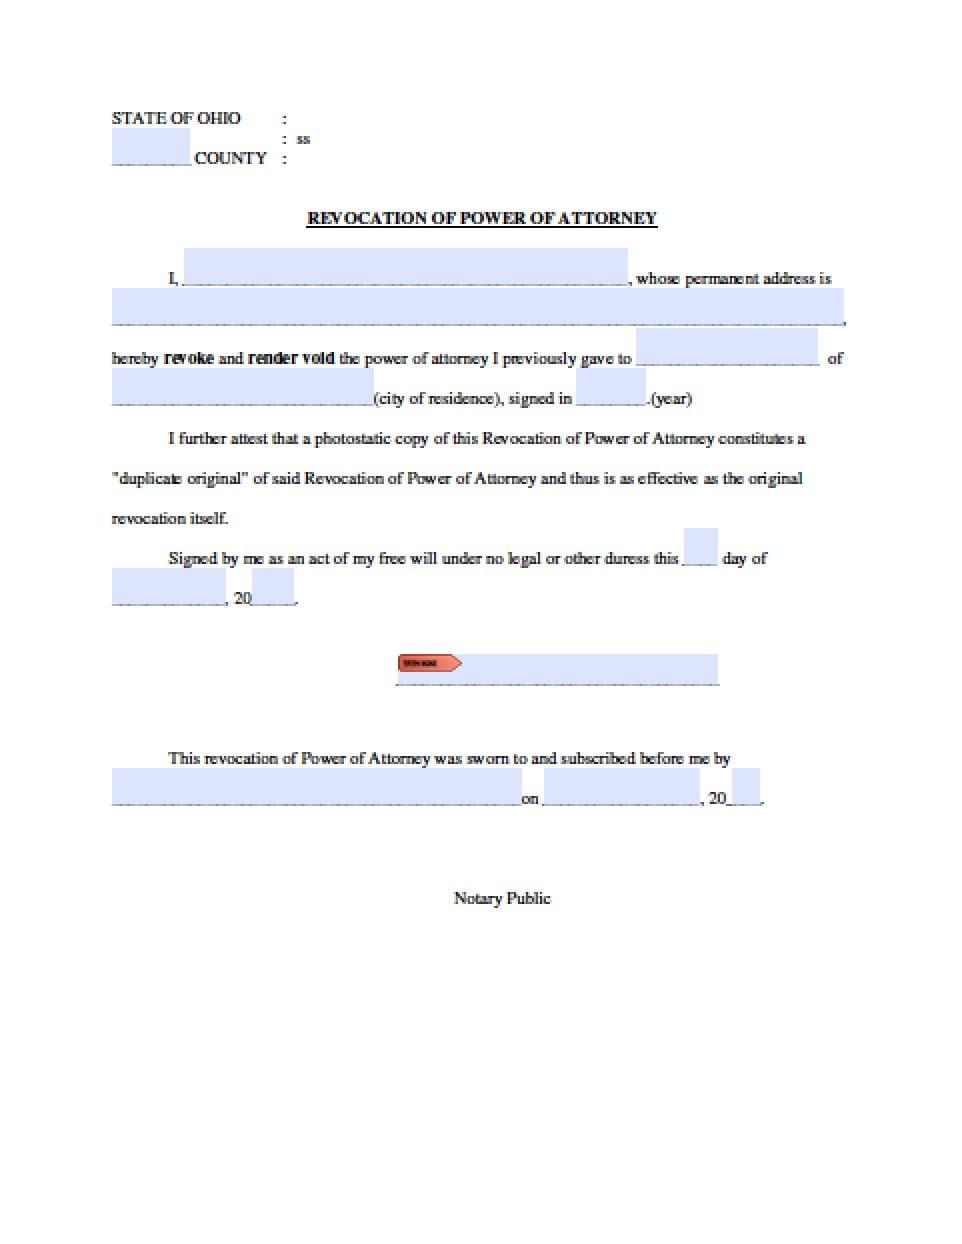 power of attorney resignation form  Ohio Revocation Power of Attorney Form - Power of Attorney ...